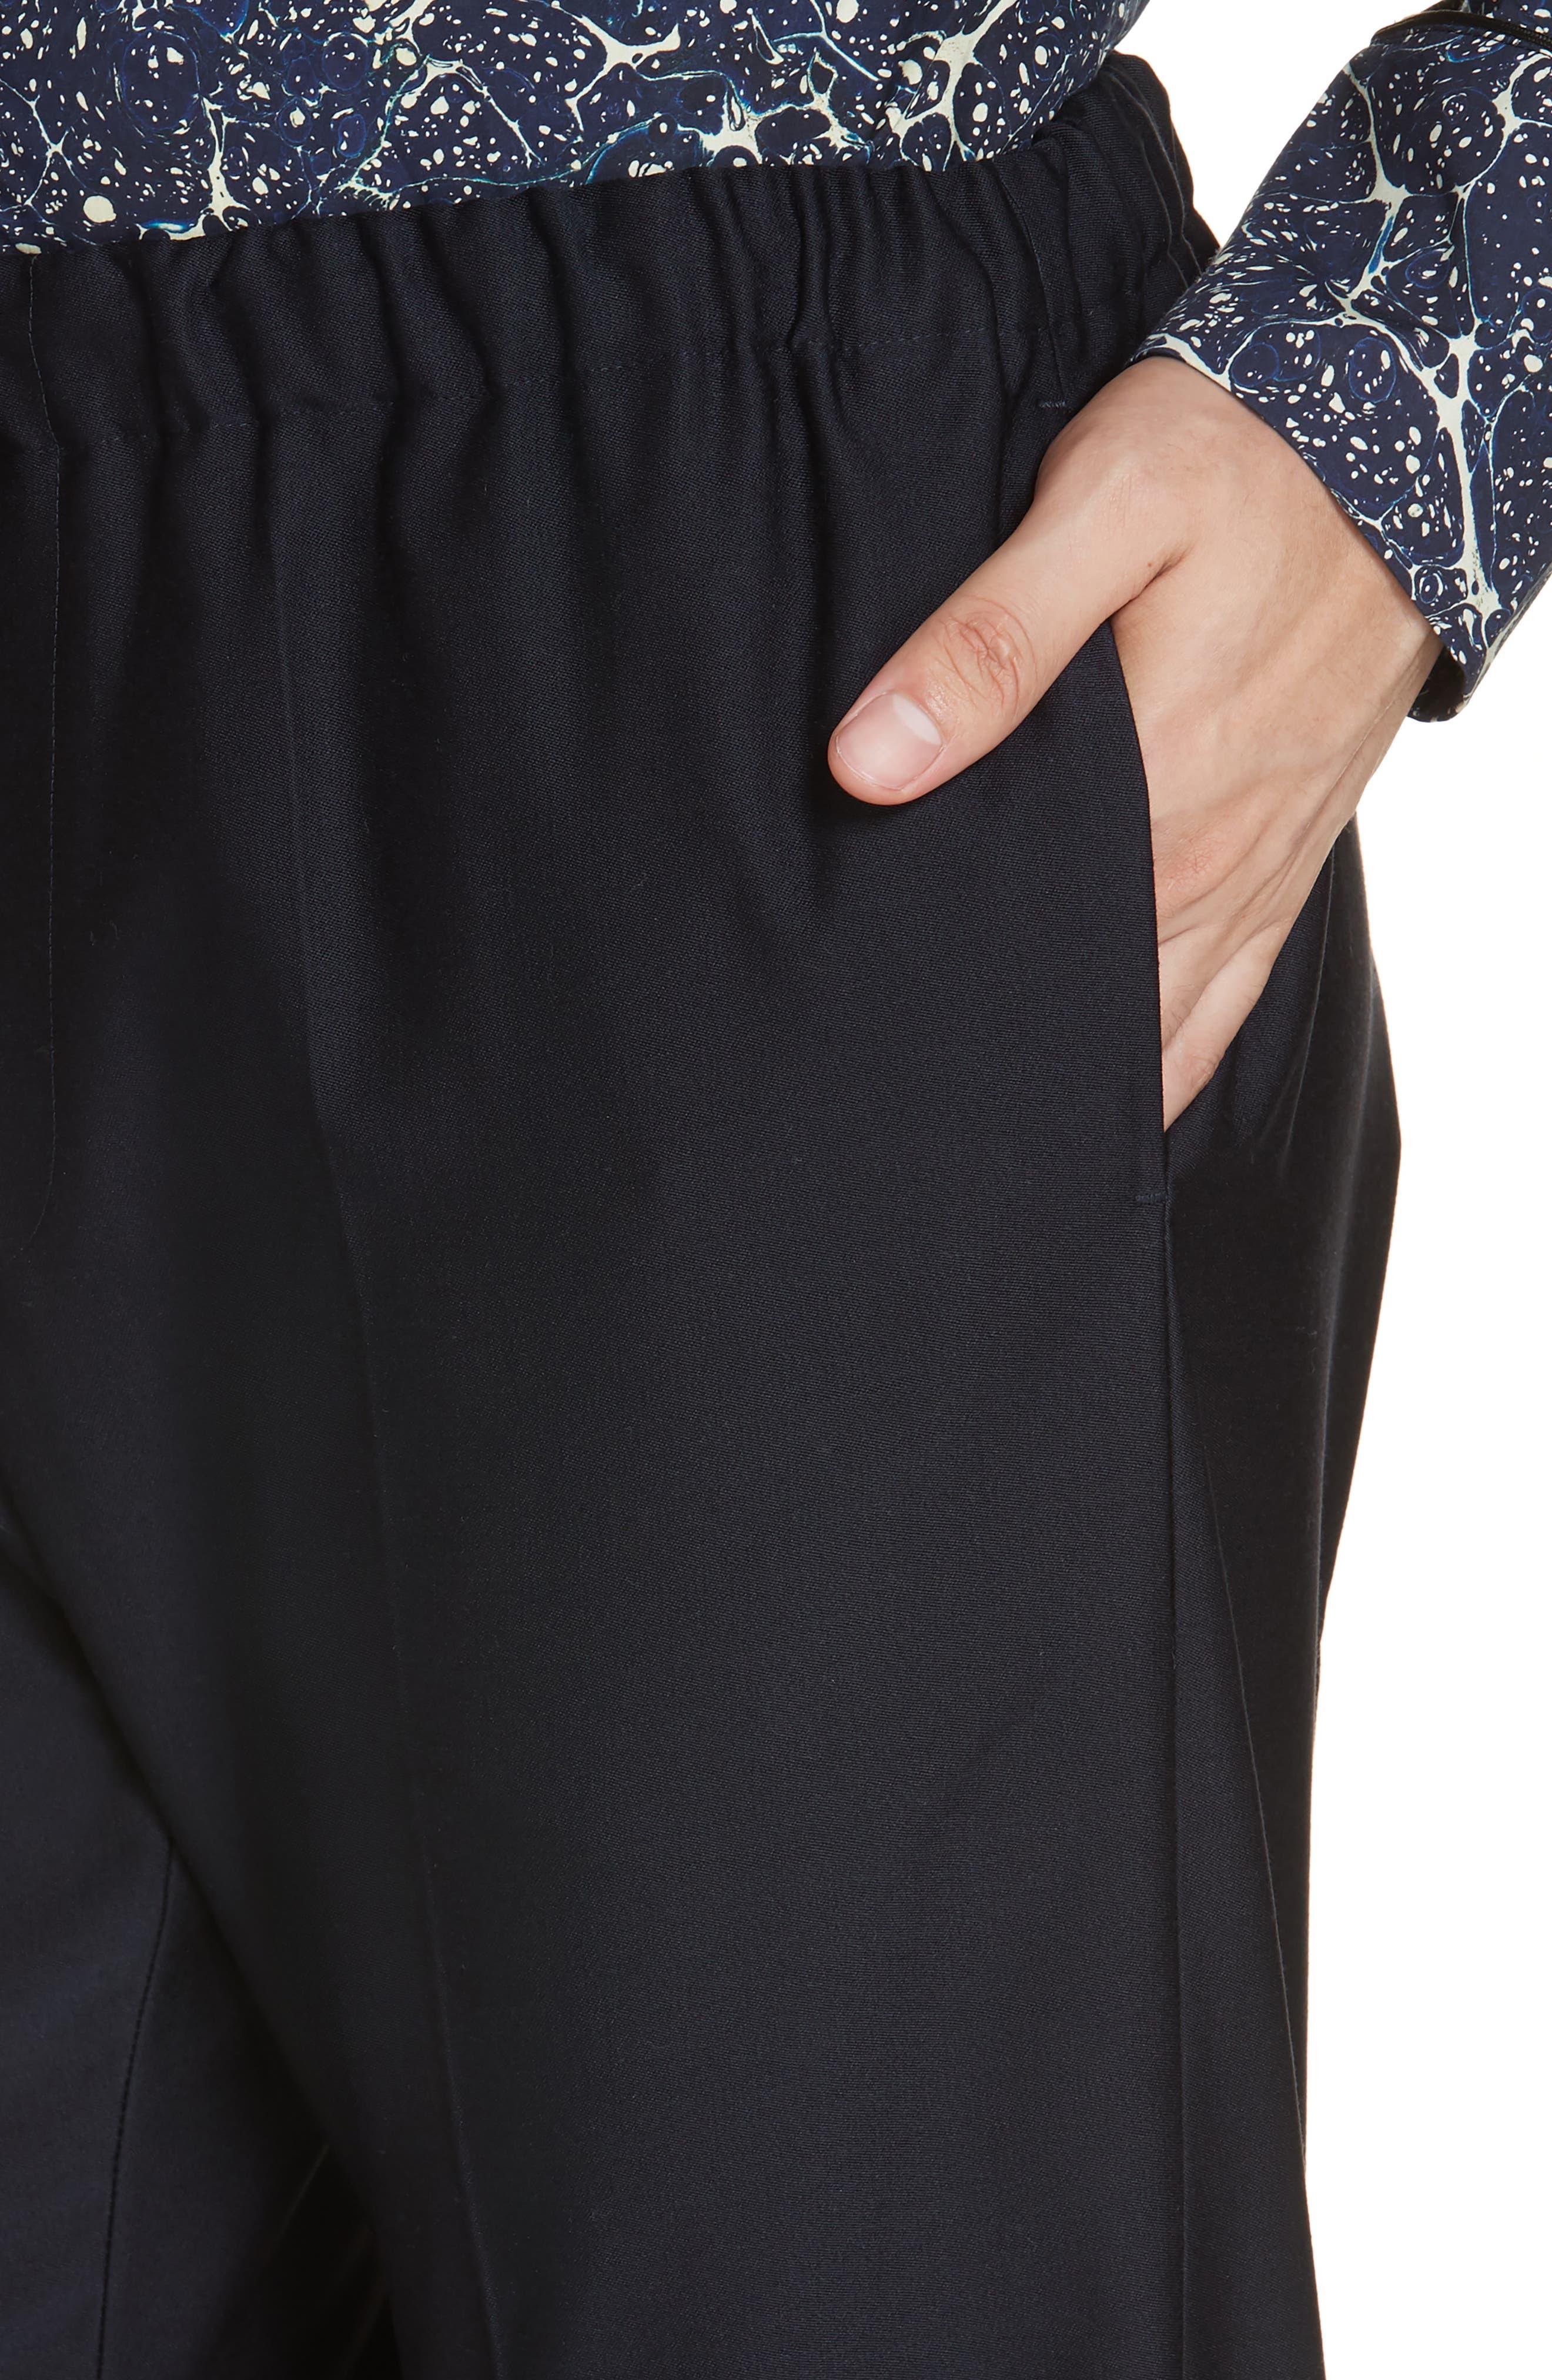 Perkino Drawstring Waist Pants,                             Alternate thumbnail 4, color,                             410